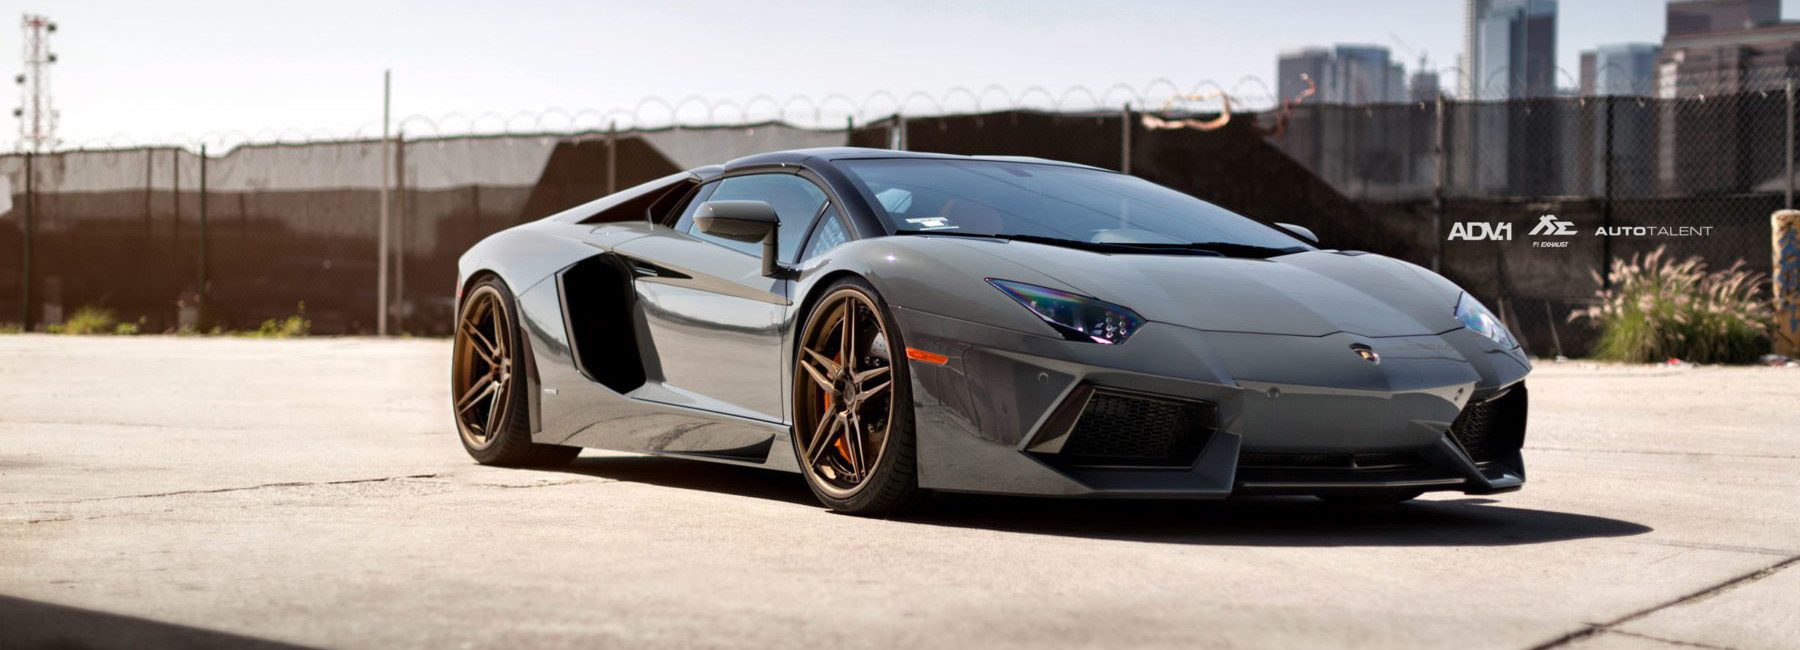 ... Nardo Gray Lamborghini Aventador Gets ADV.1 Wheels On Gray Lamborghini  Spyder, Gray Lamborghini ...